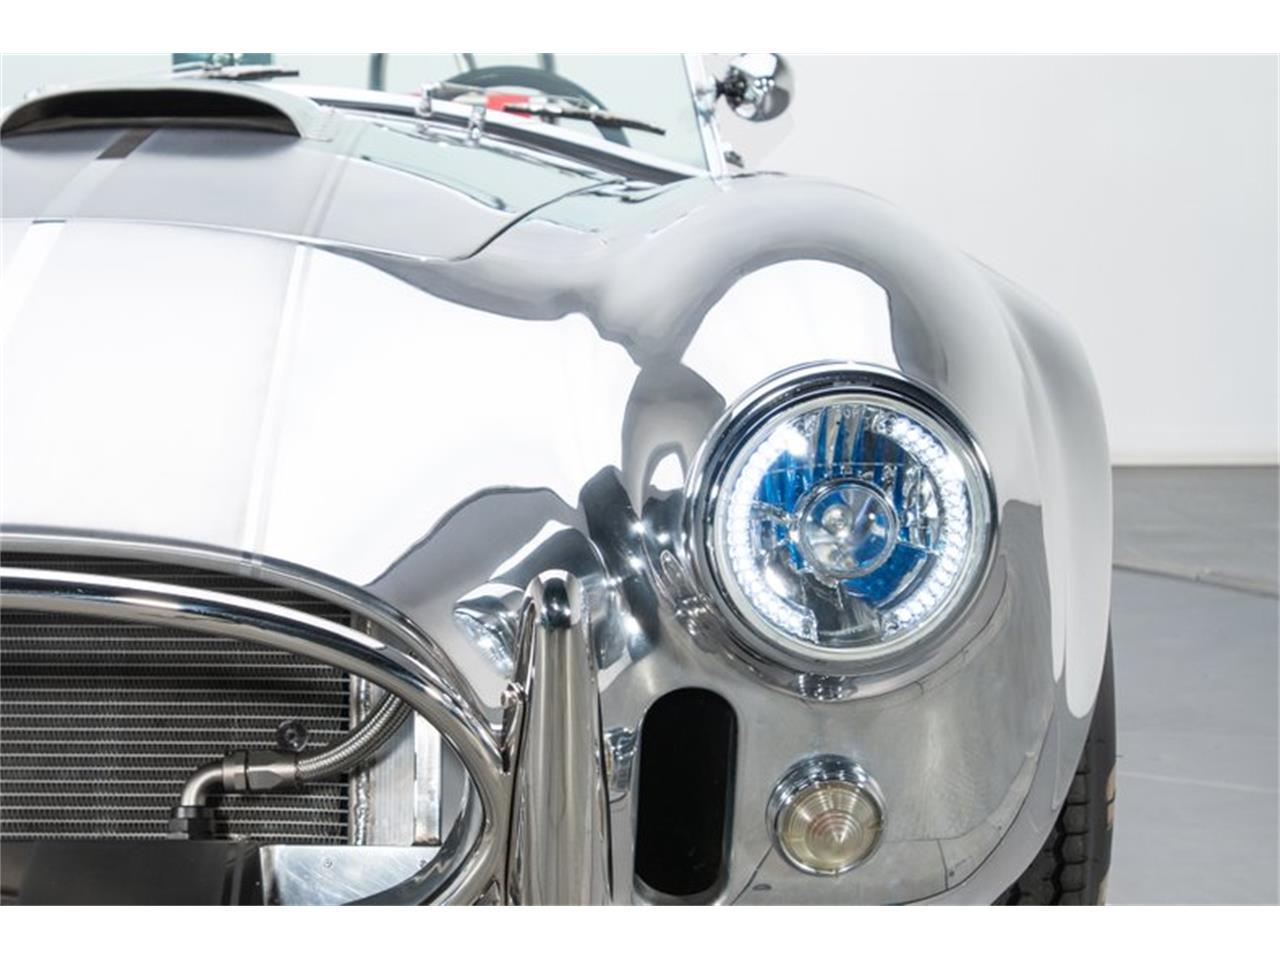 Large Picture of Classic '65 Kirkham Cobra located in North Carolina - $159,900.00 - PUR4